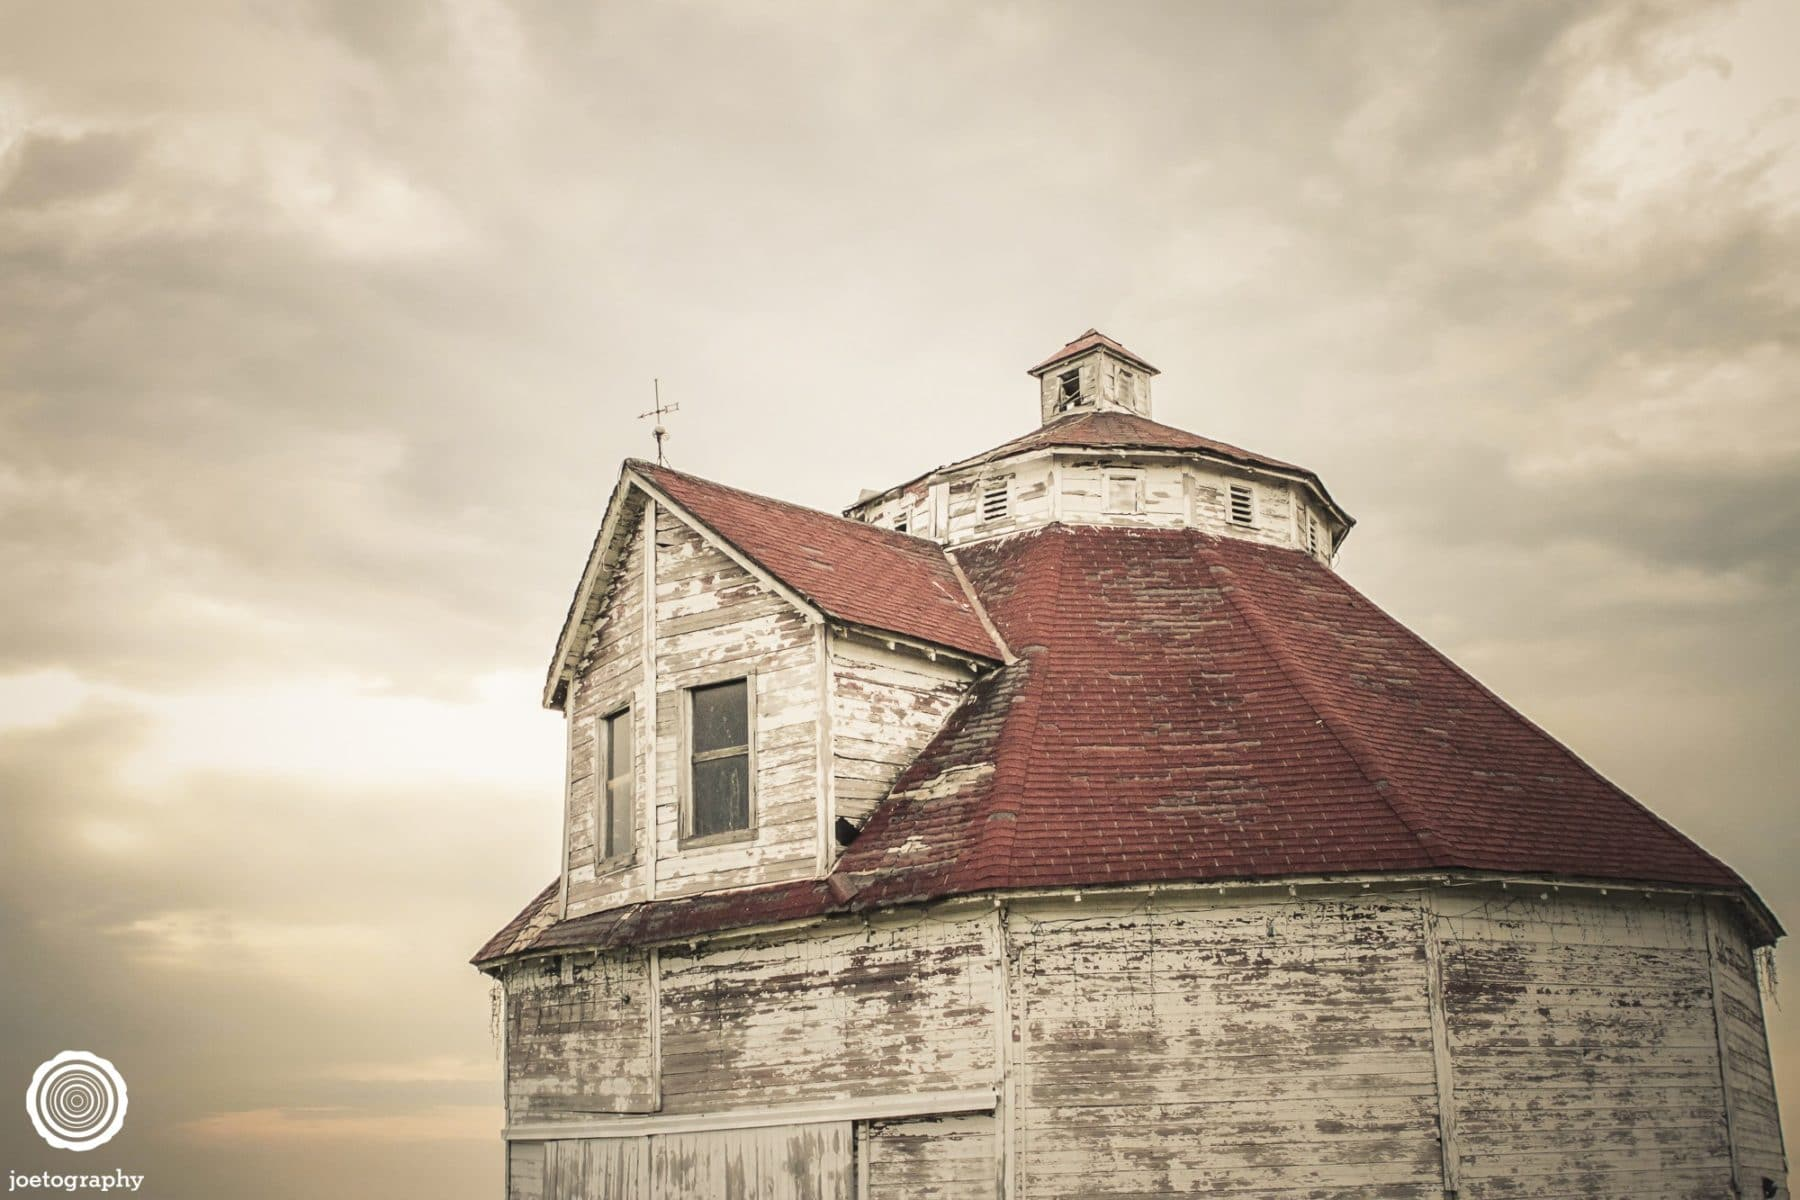 polygonal-barn-architecture-photos-shelbyville-indiana-24